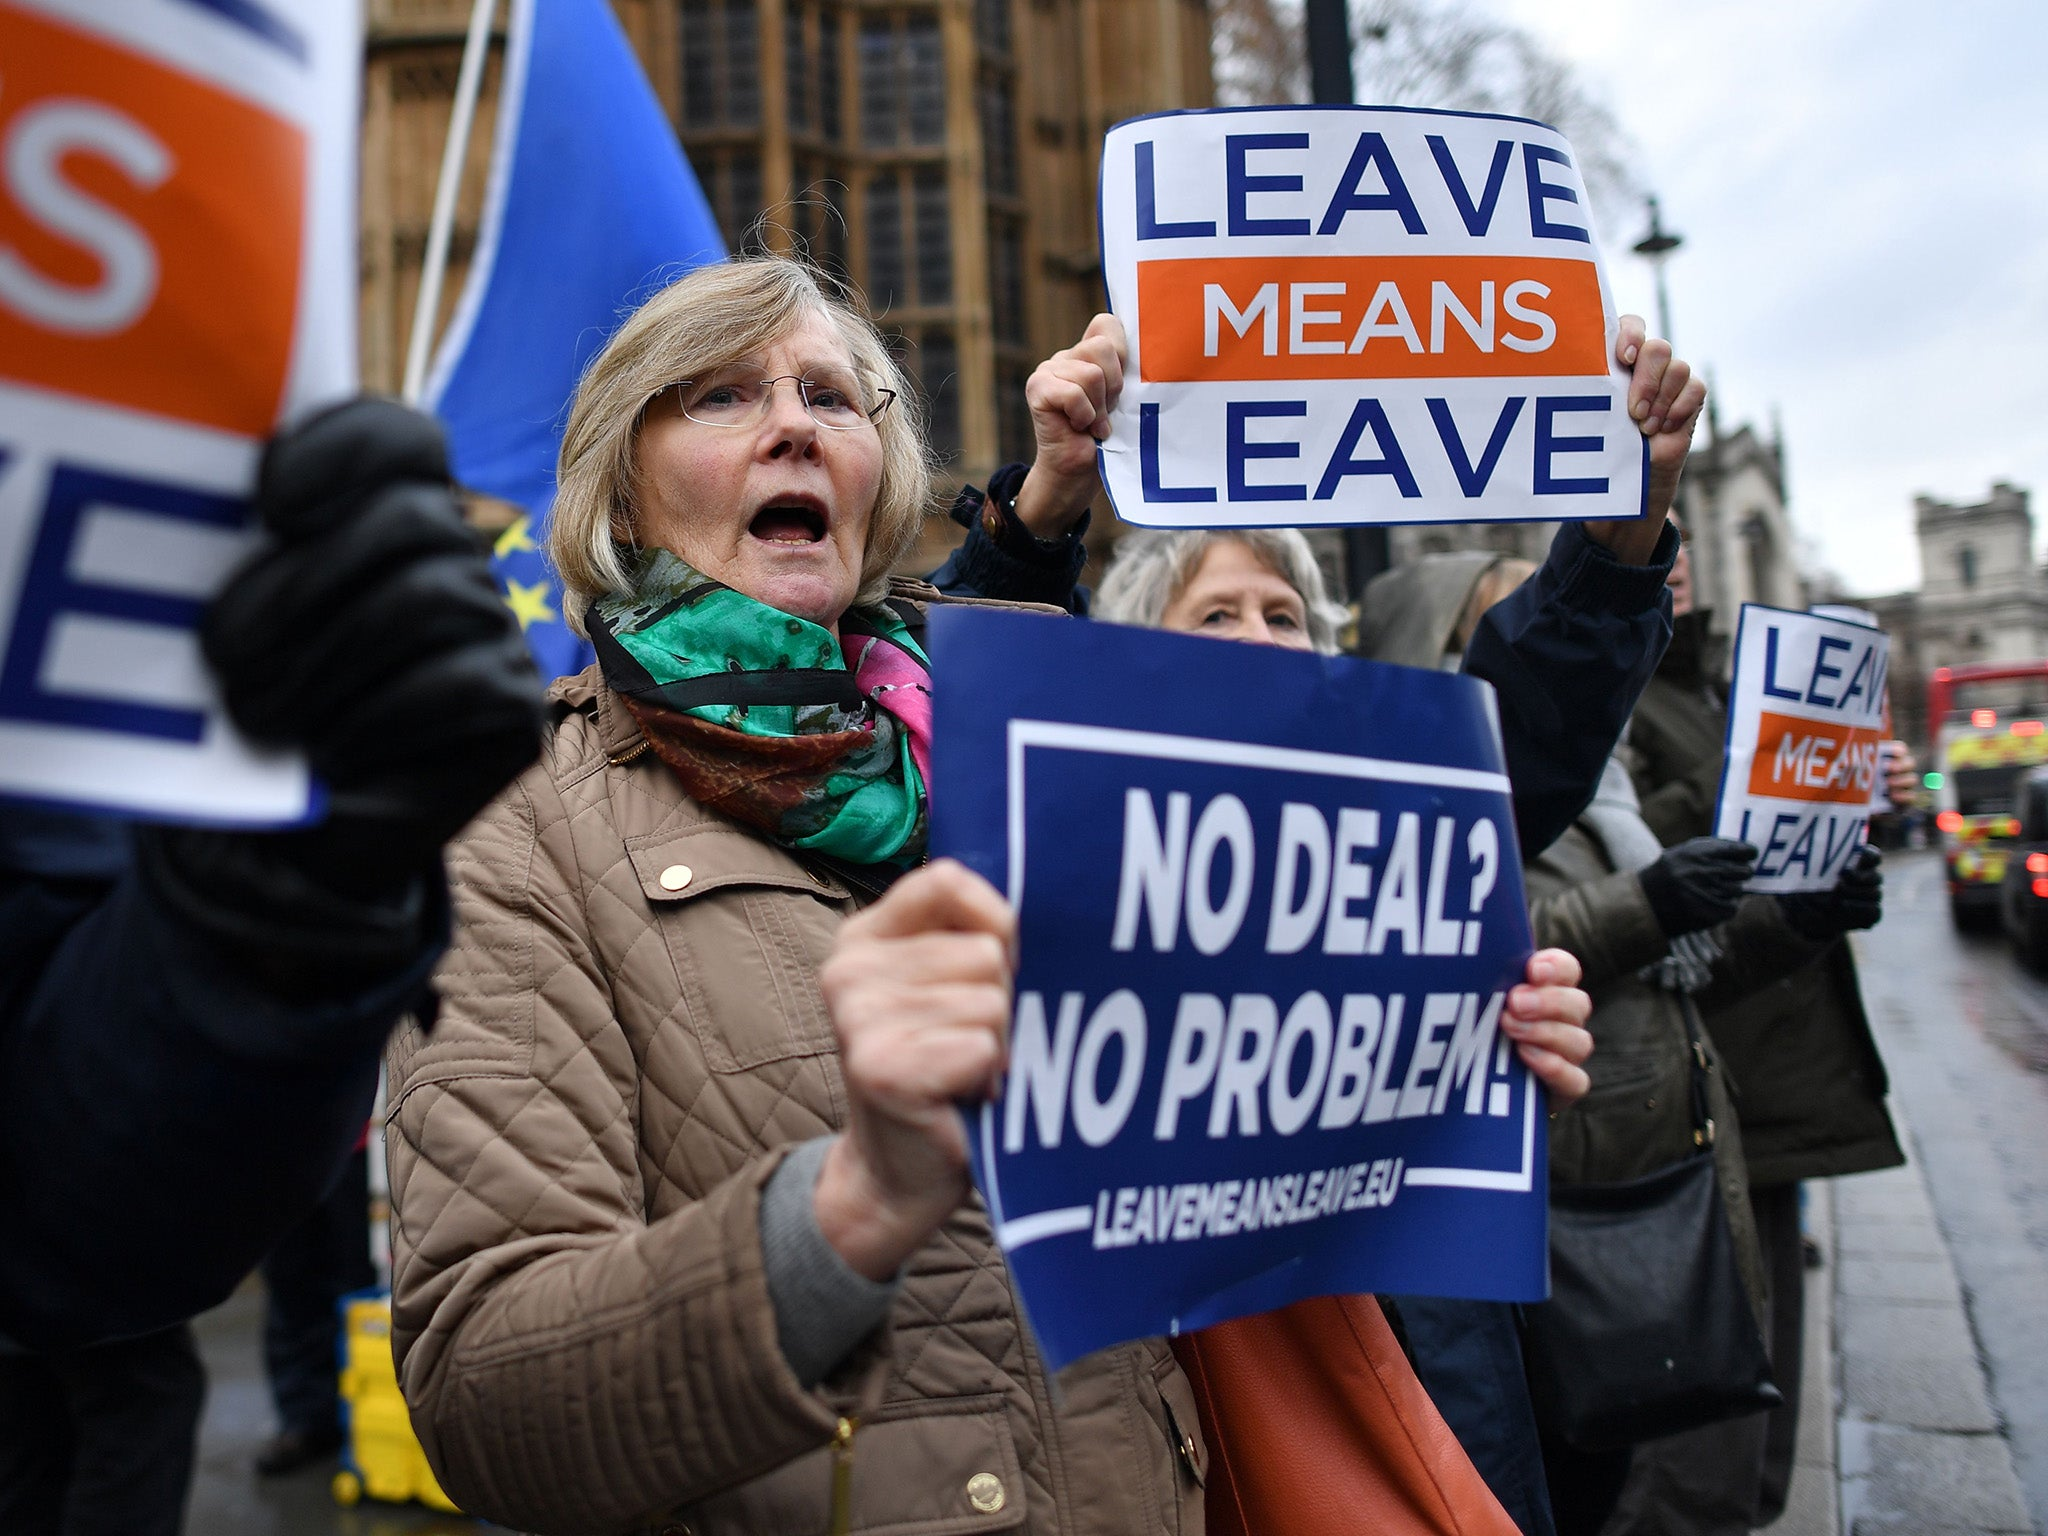 Boris Johnson's no-deal bluster has put Leave voters' livelihoods on the line